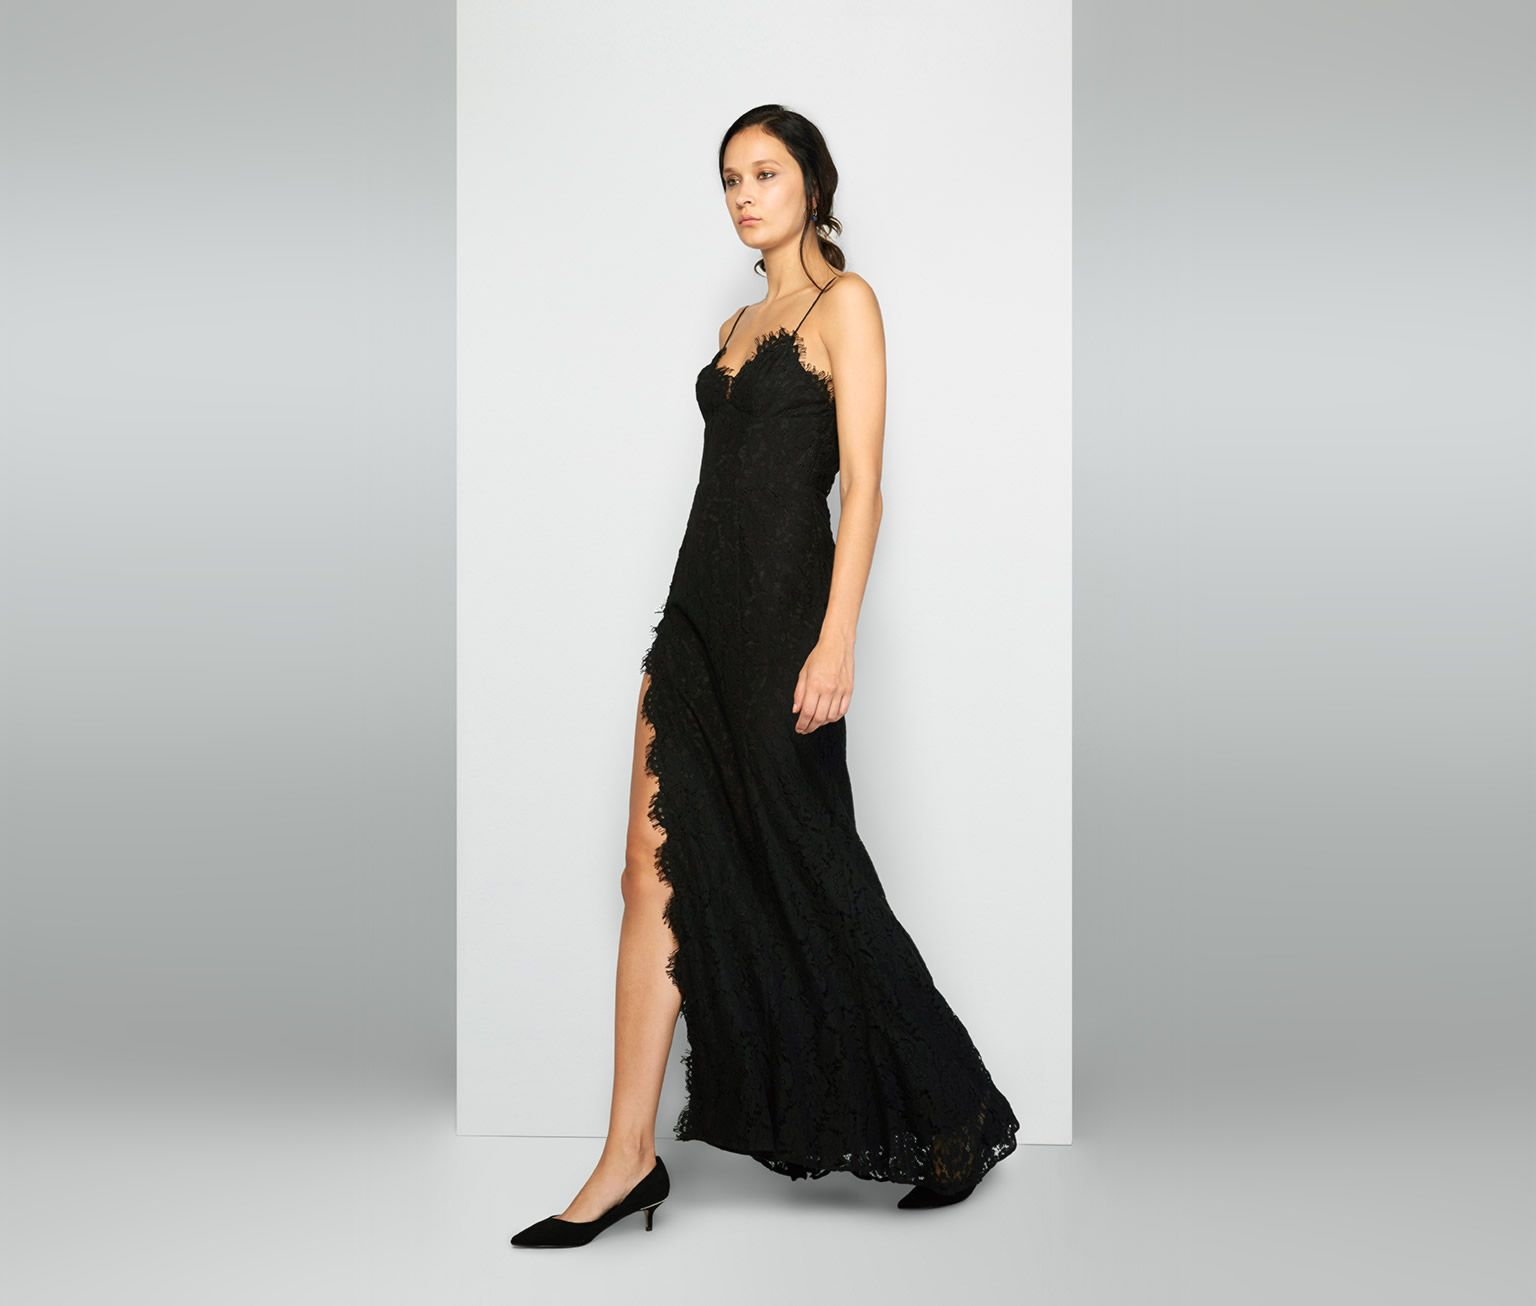 b079c1ed37124 Everett | Dressed Up | Dresses, Prom dresses, Lace dress